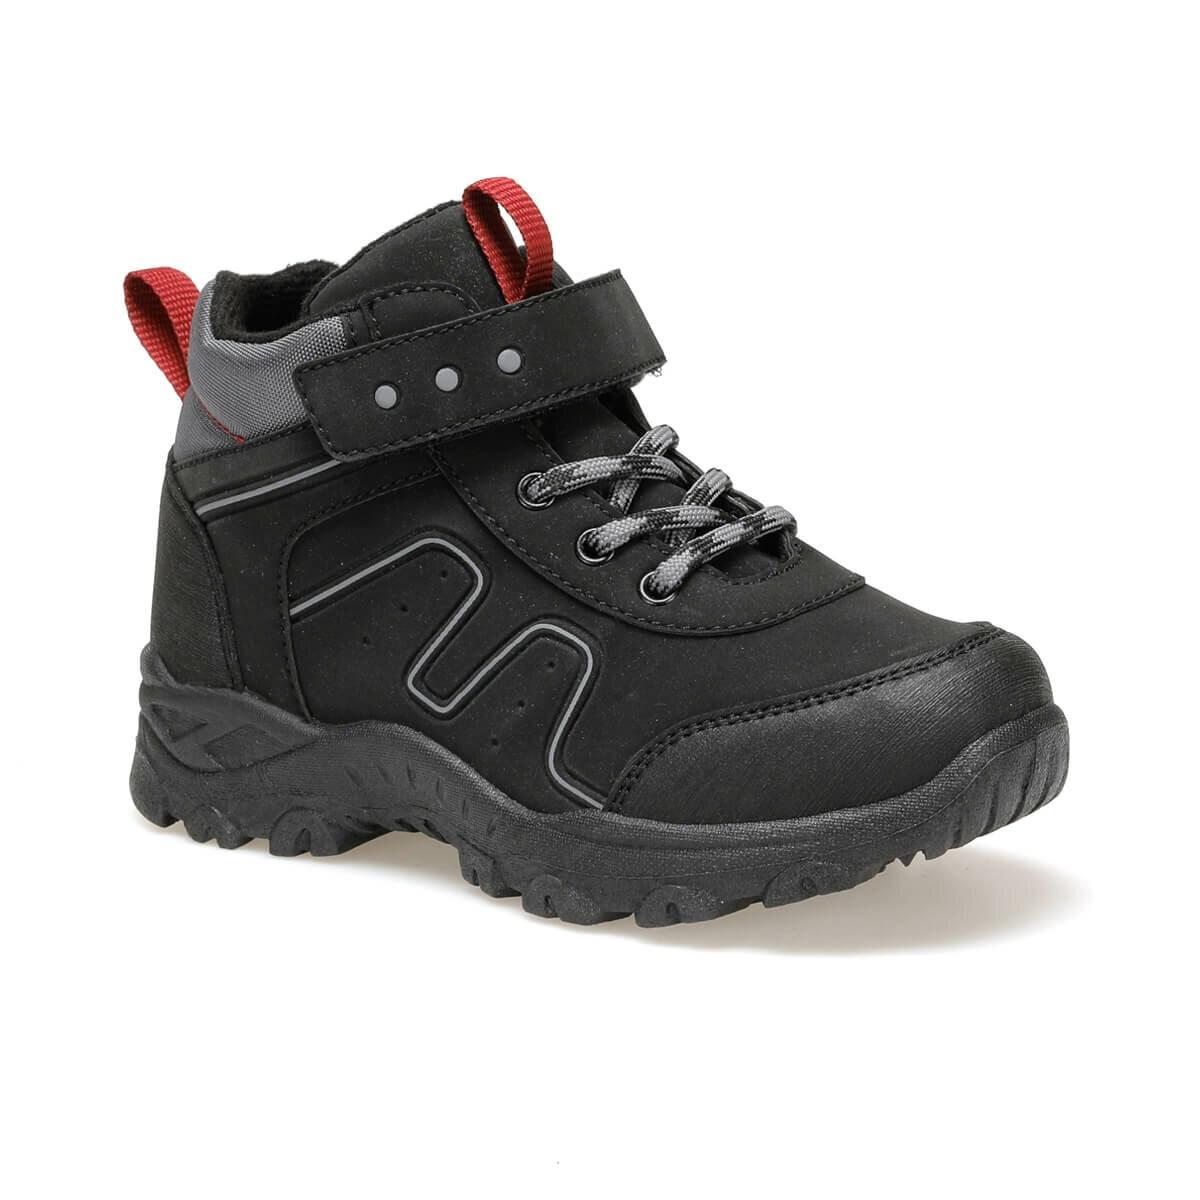 FLO FAVORITE Black Male Child Boots I-Cool